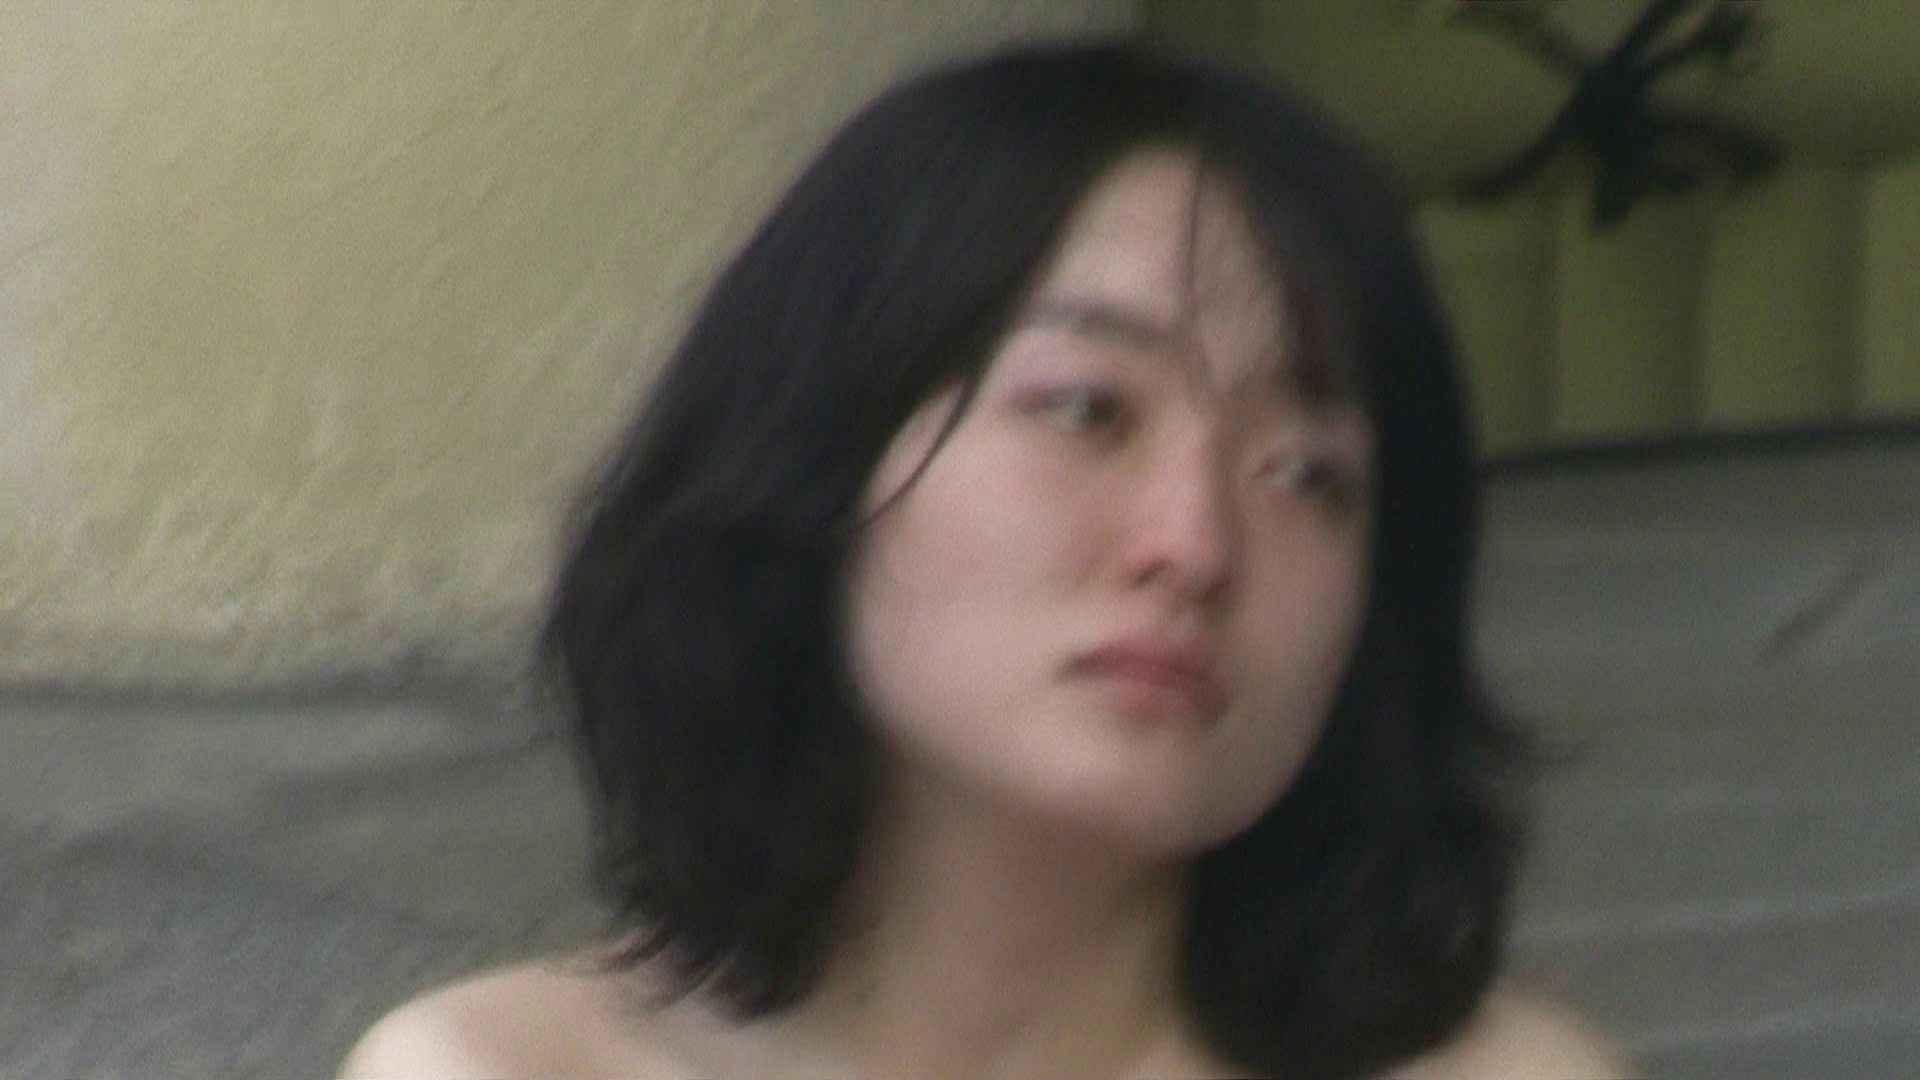 Aquaな露天風呂Vol.681 露天 | OLセックス  98画像 58